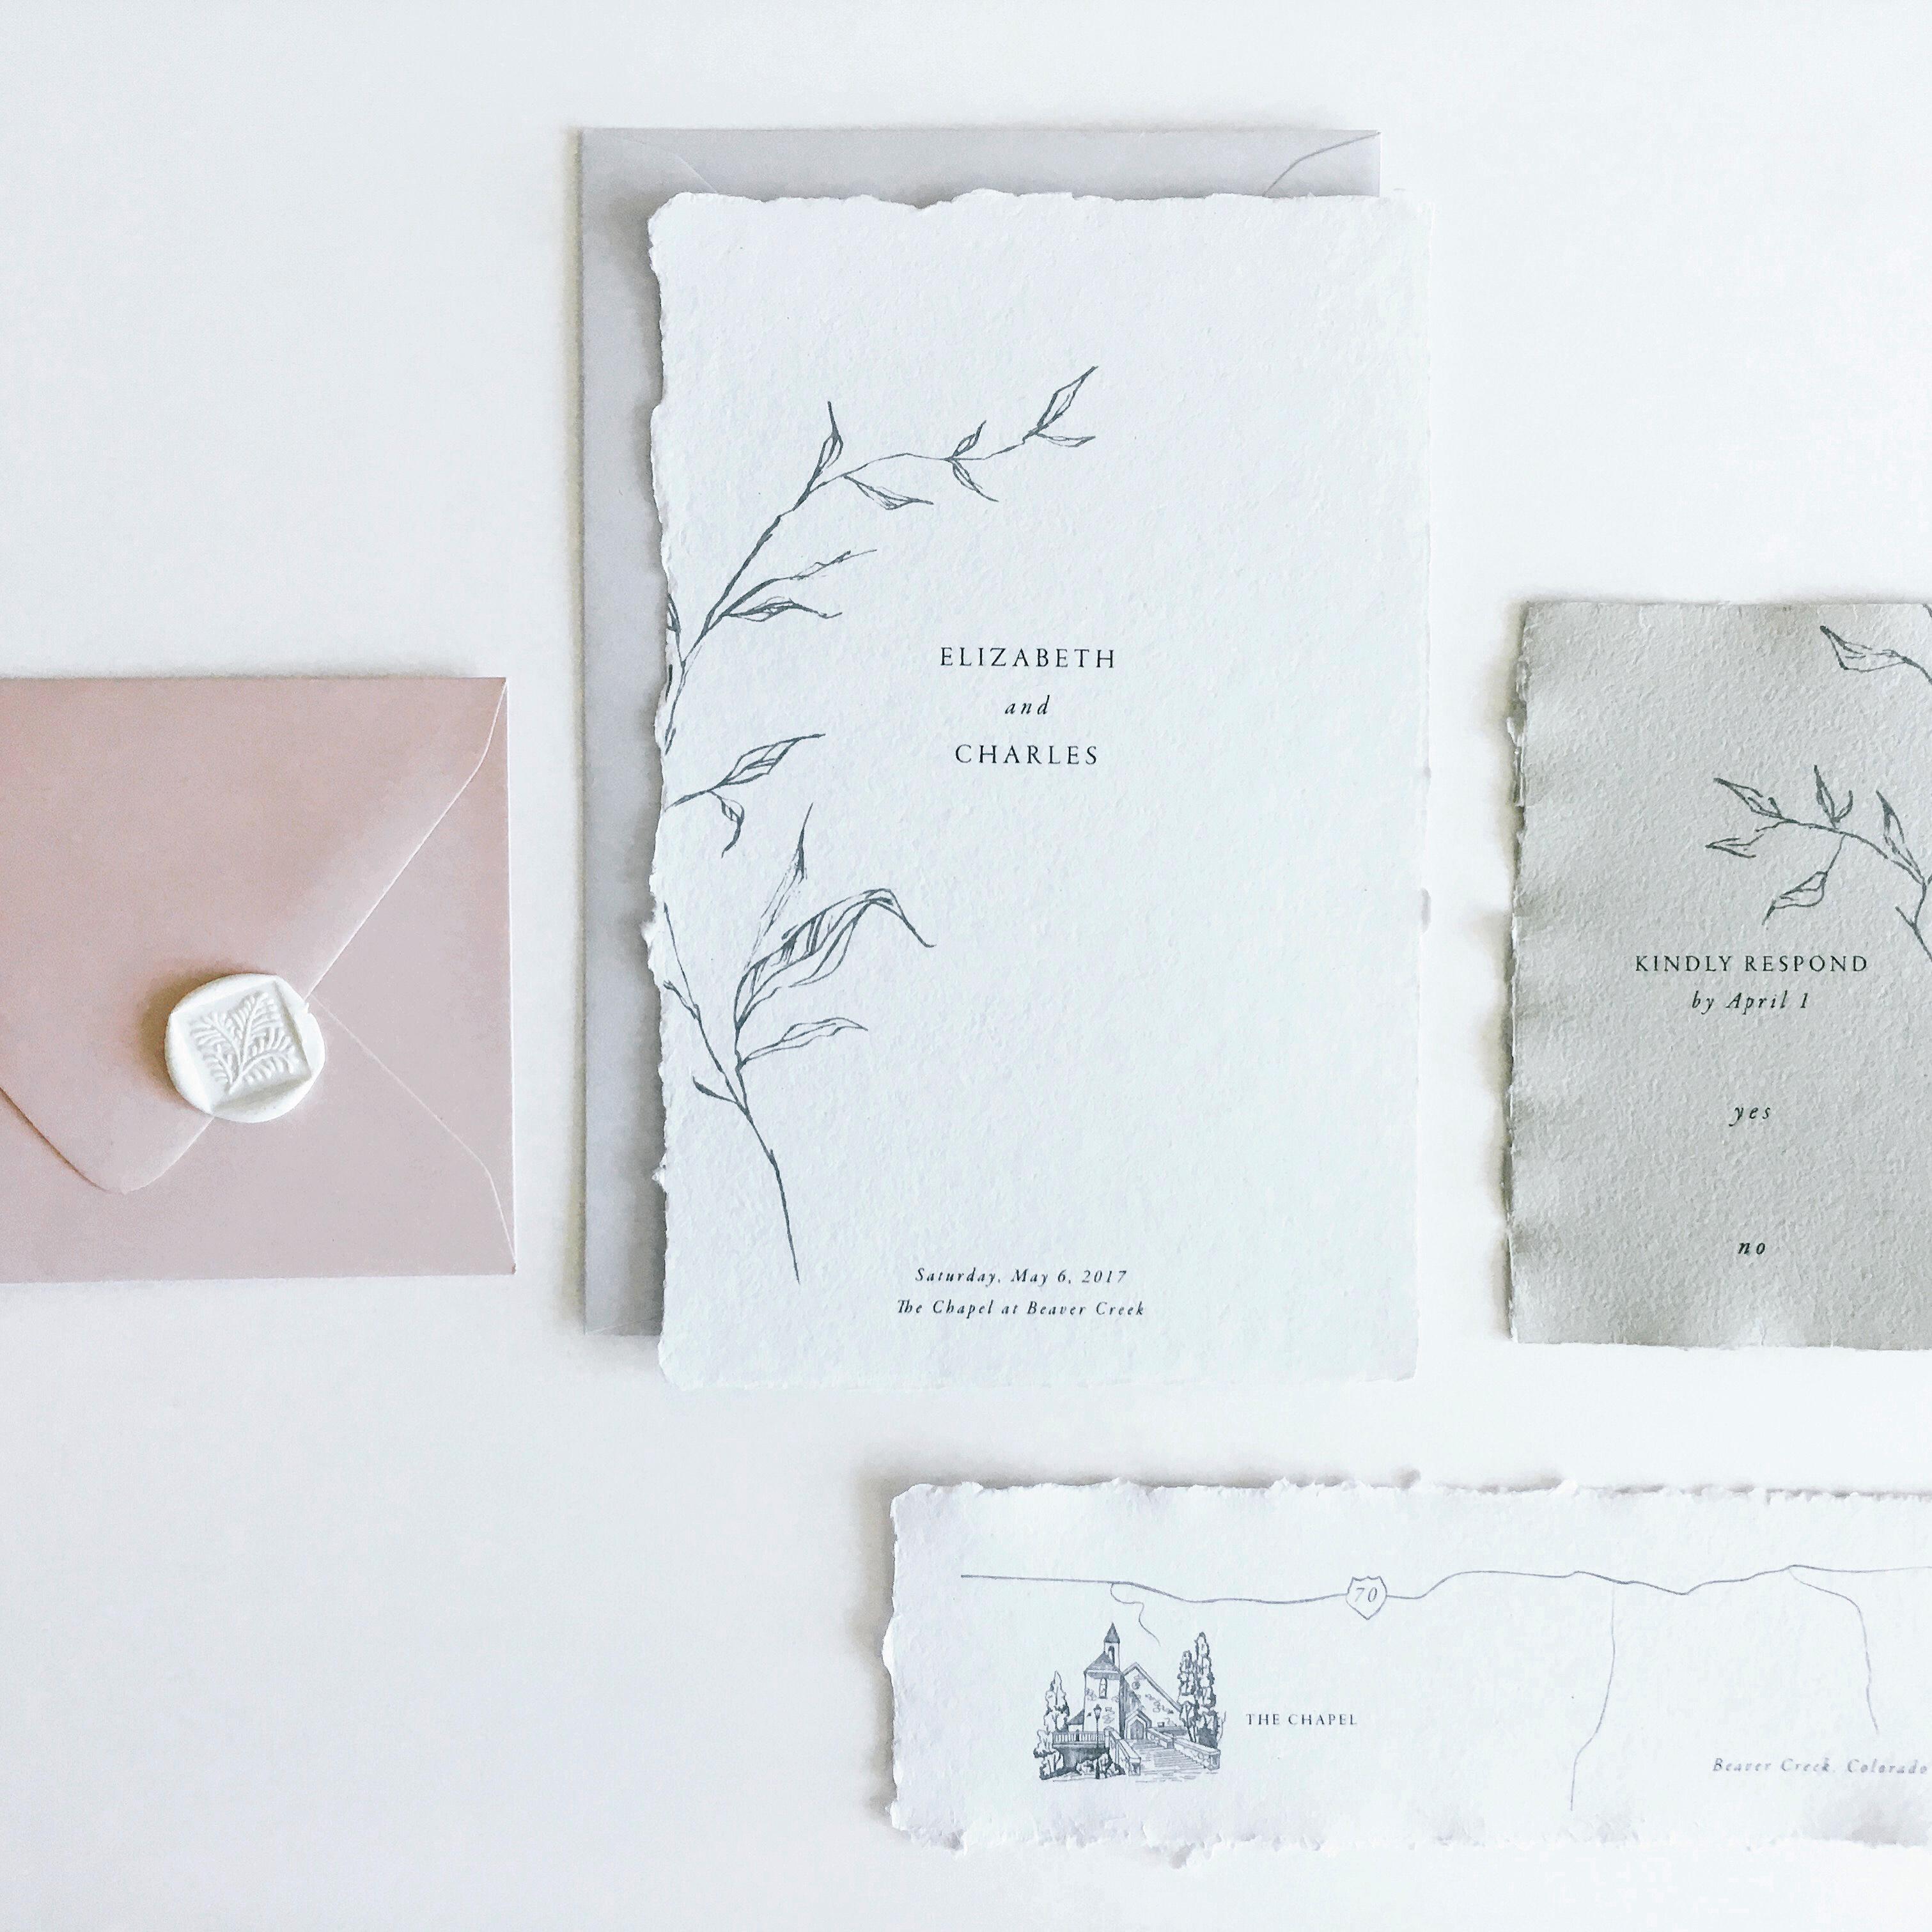 wedding invitation negative space romantic minimalism deckled edges